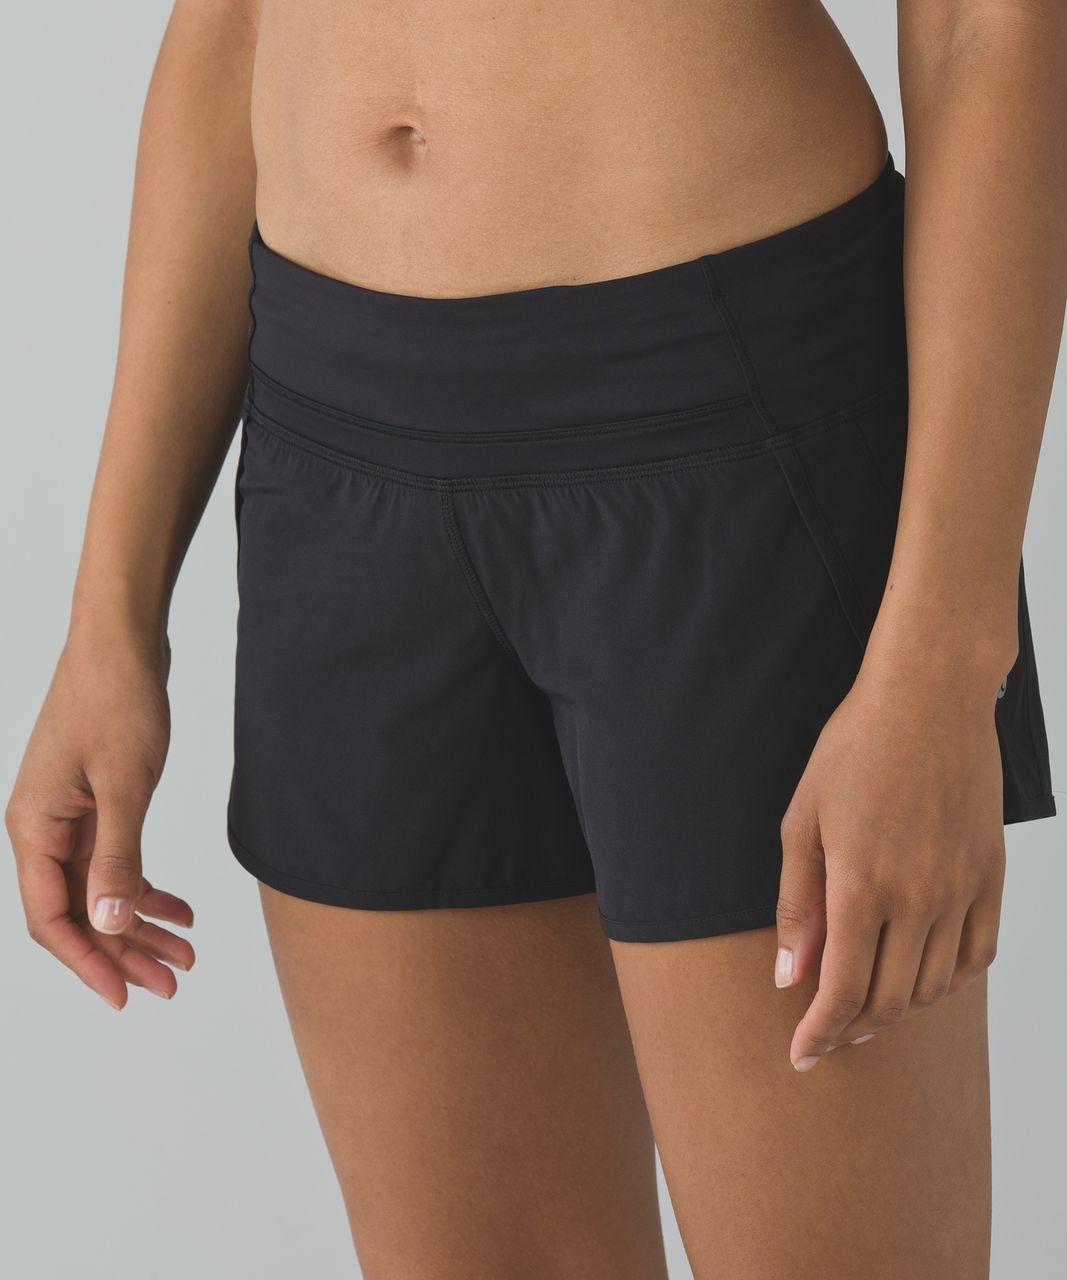 Lululemon Run Times Short *4-way Stretch - Black